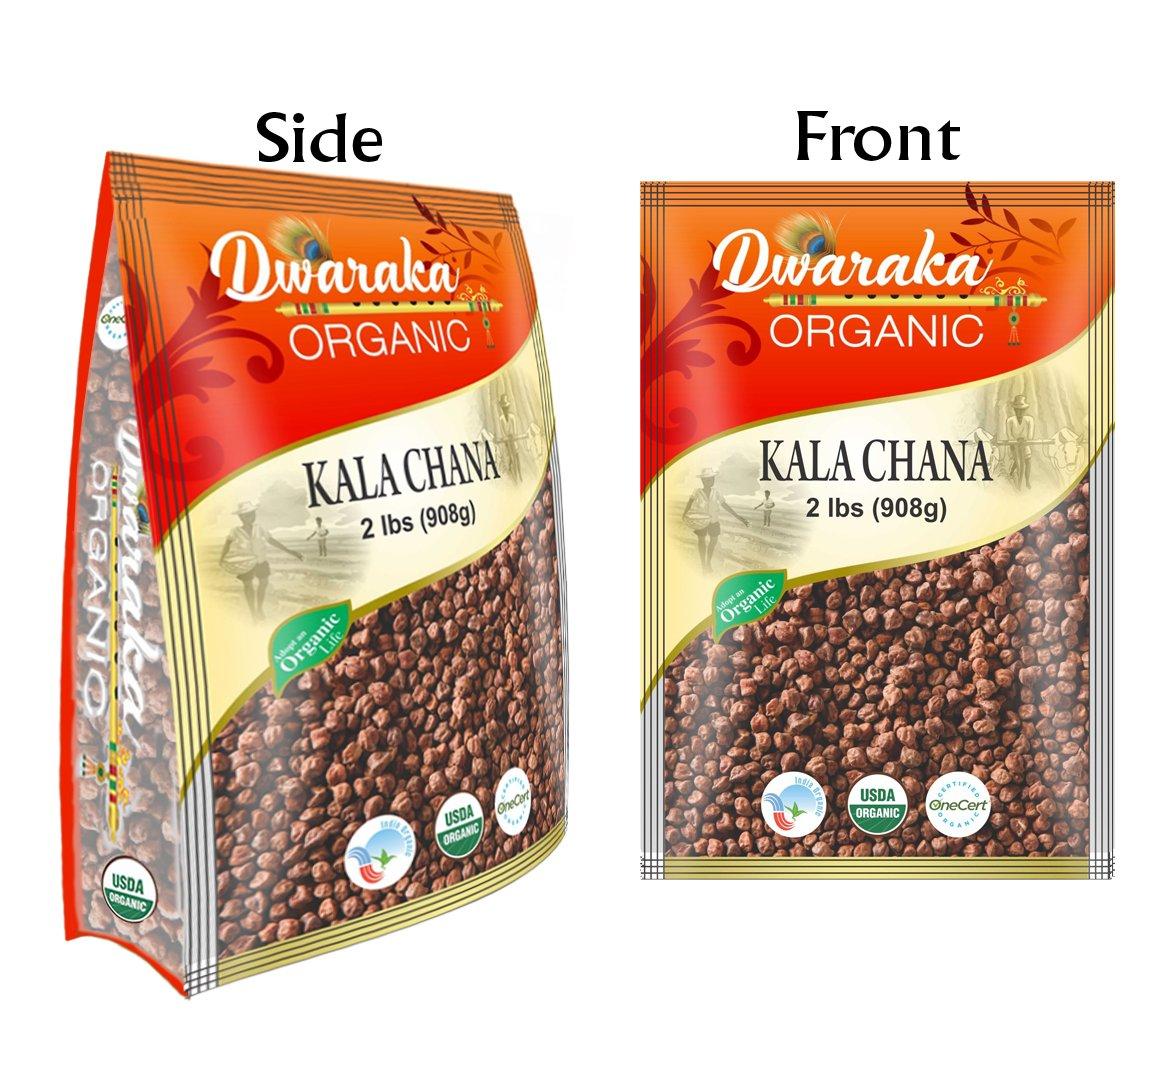 Dwaraka Organic Bengal Gram Whole Kaala Chana Lentil USDA Organic (2 lbs/908 g)